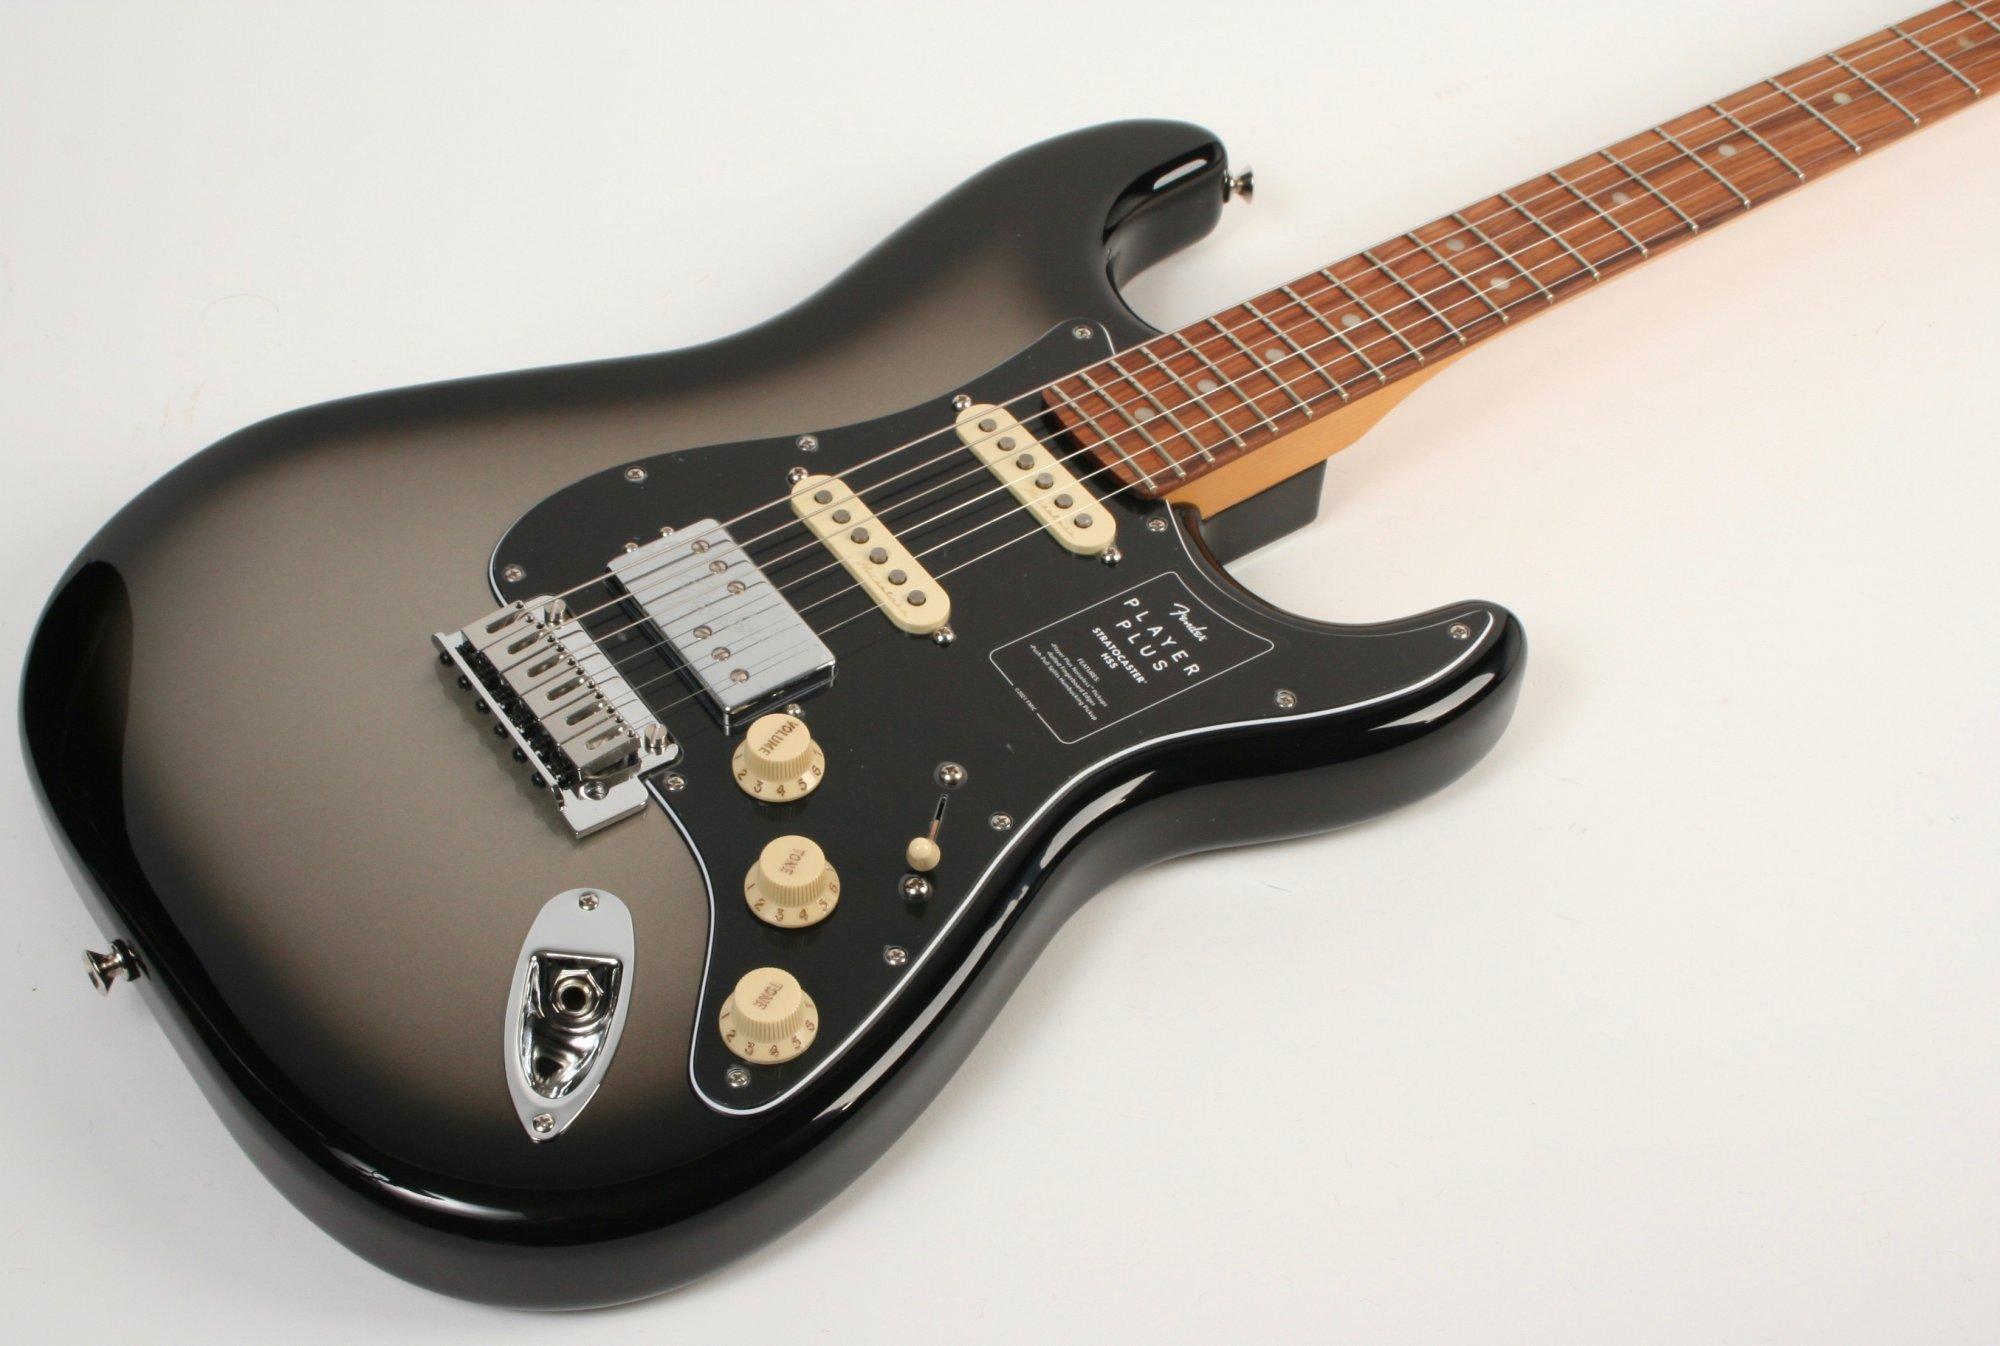 Fender Player Plus Stratocaster HSS Pau Ferro Fingerboard Silverburst